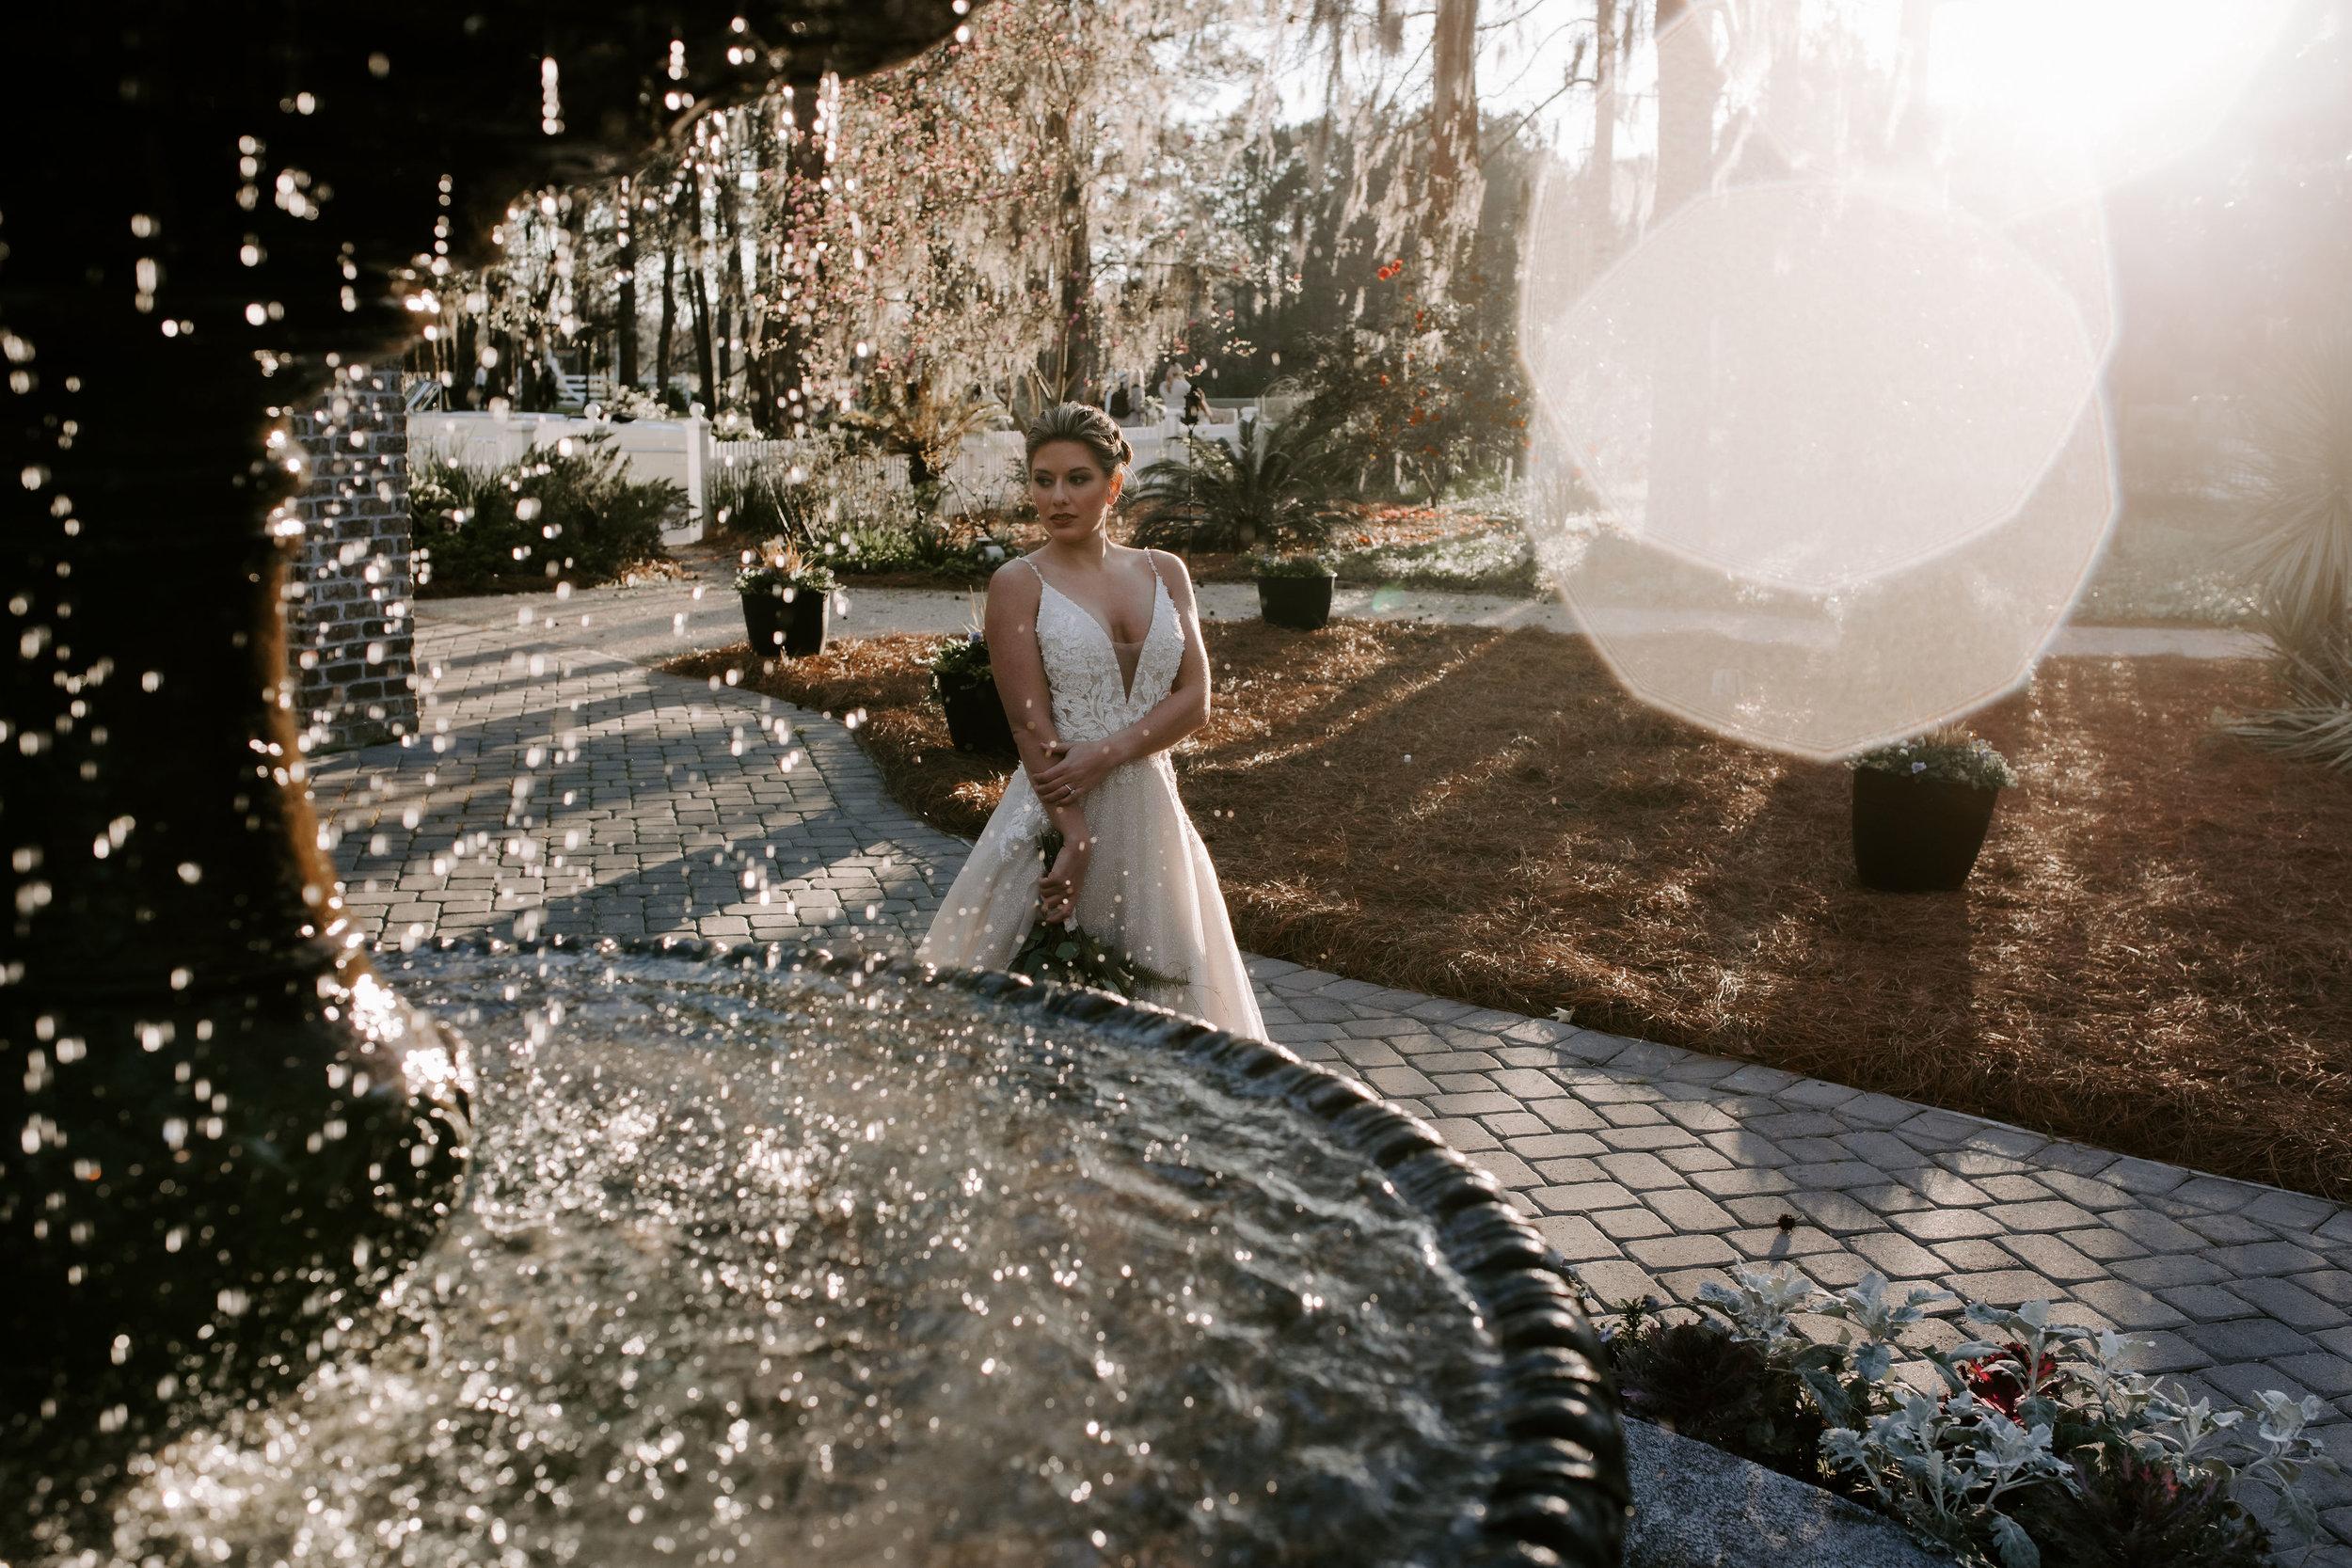 ivory-and-beau-blog-mackey-house-styled-shoot-savannah-wedding-bridal-boutique-savannah-florist-southern-wedding-_G5A2737.jpg